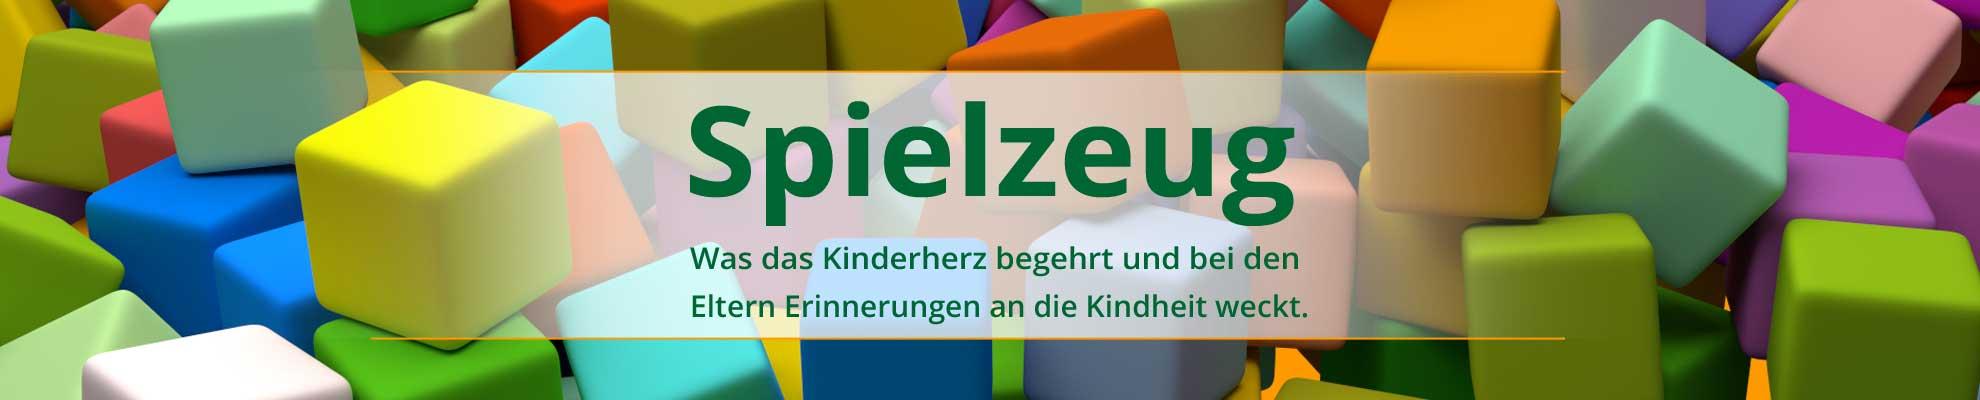 Magazin Halsenbach - Spielzeug